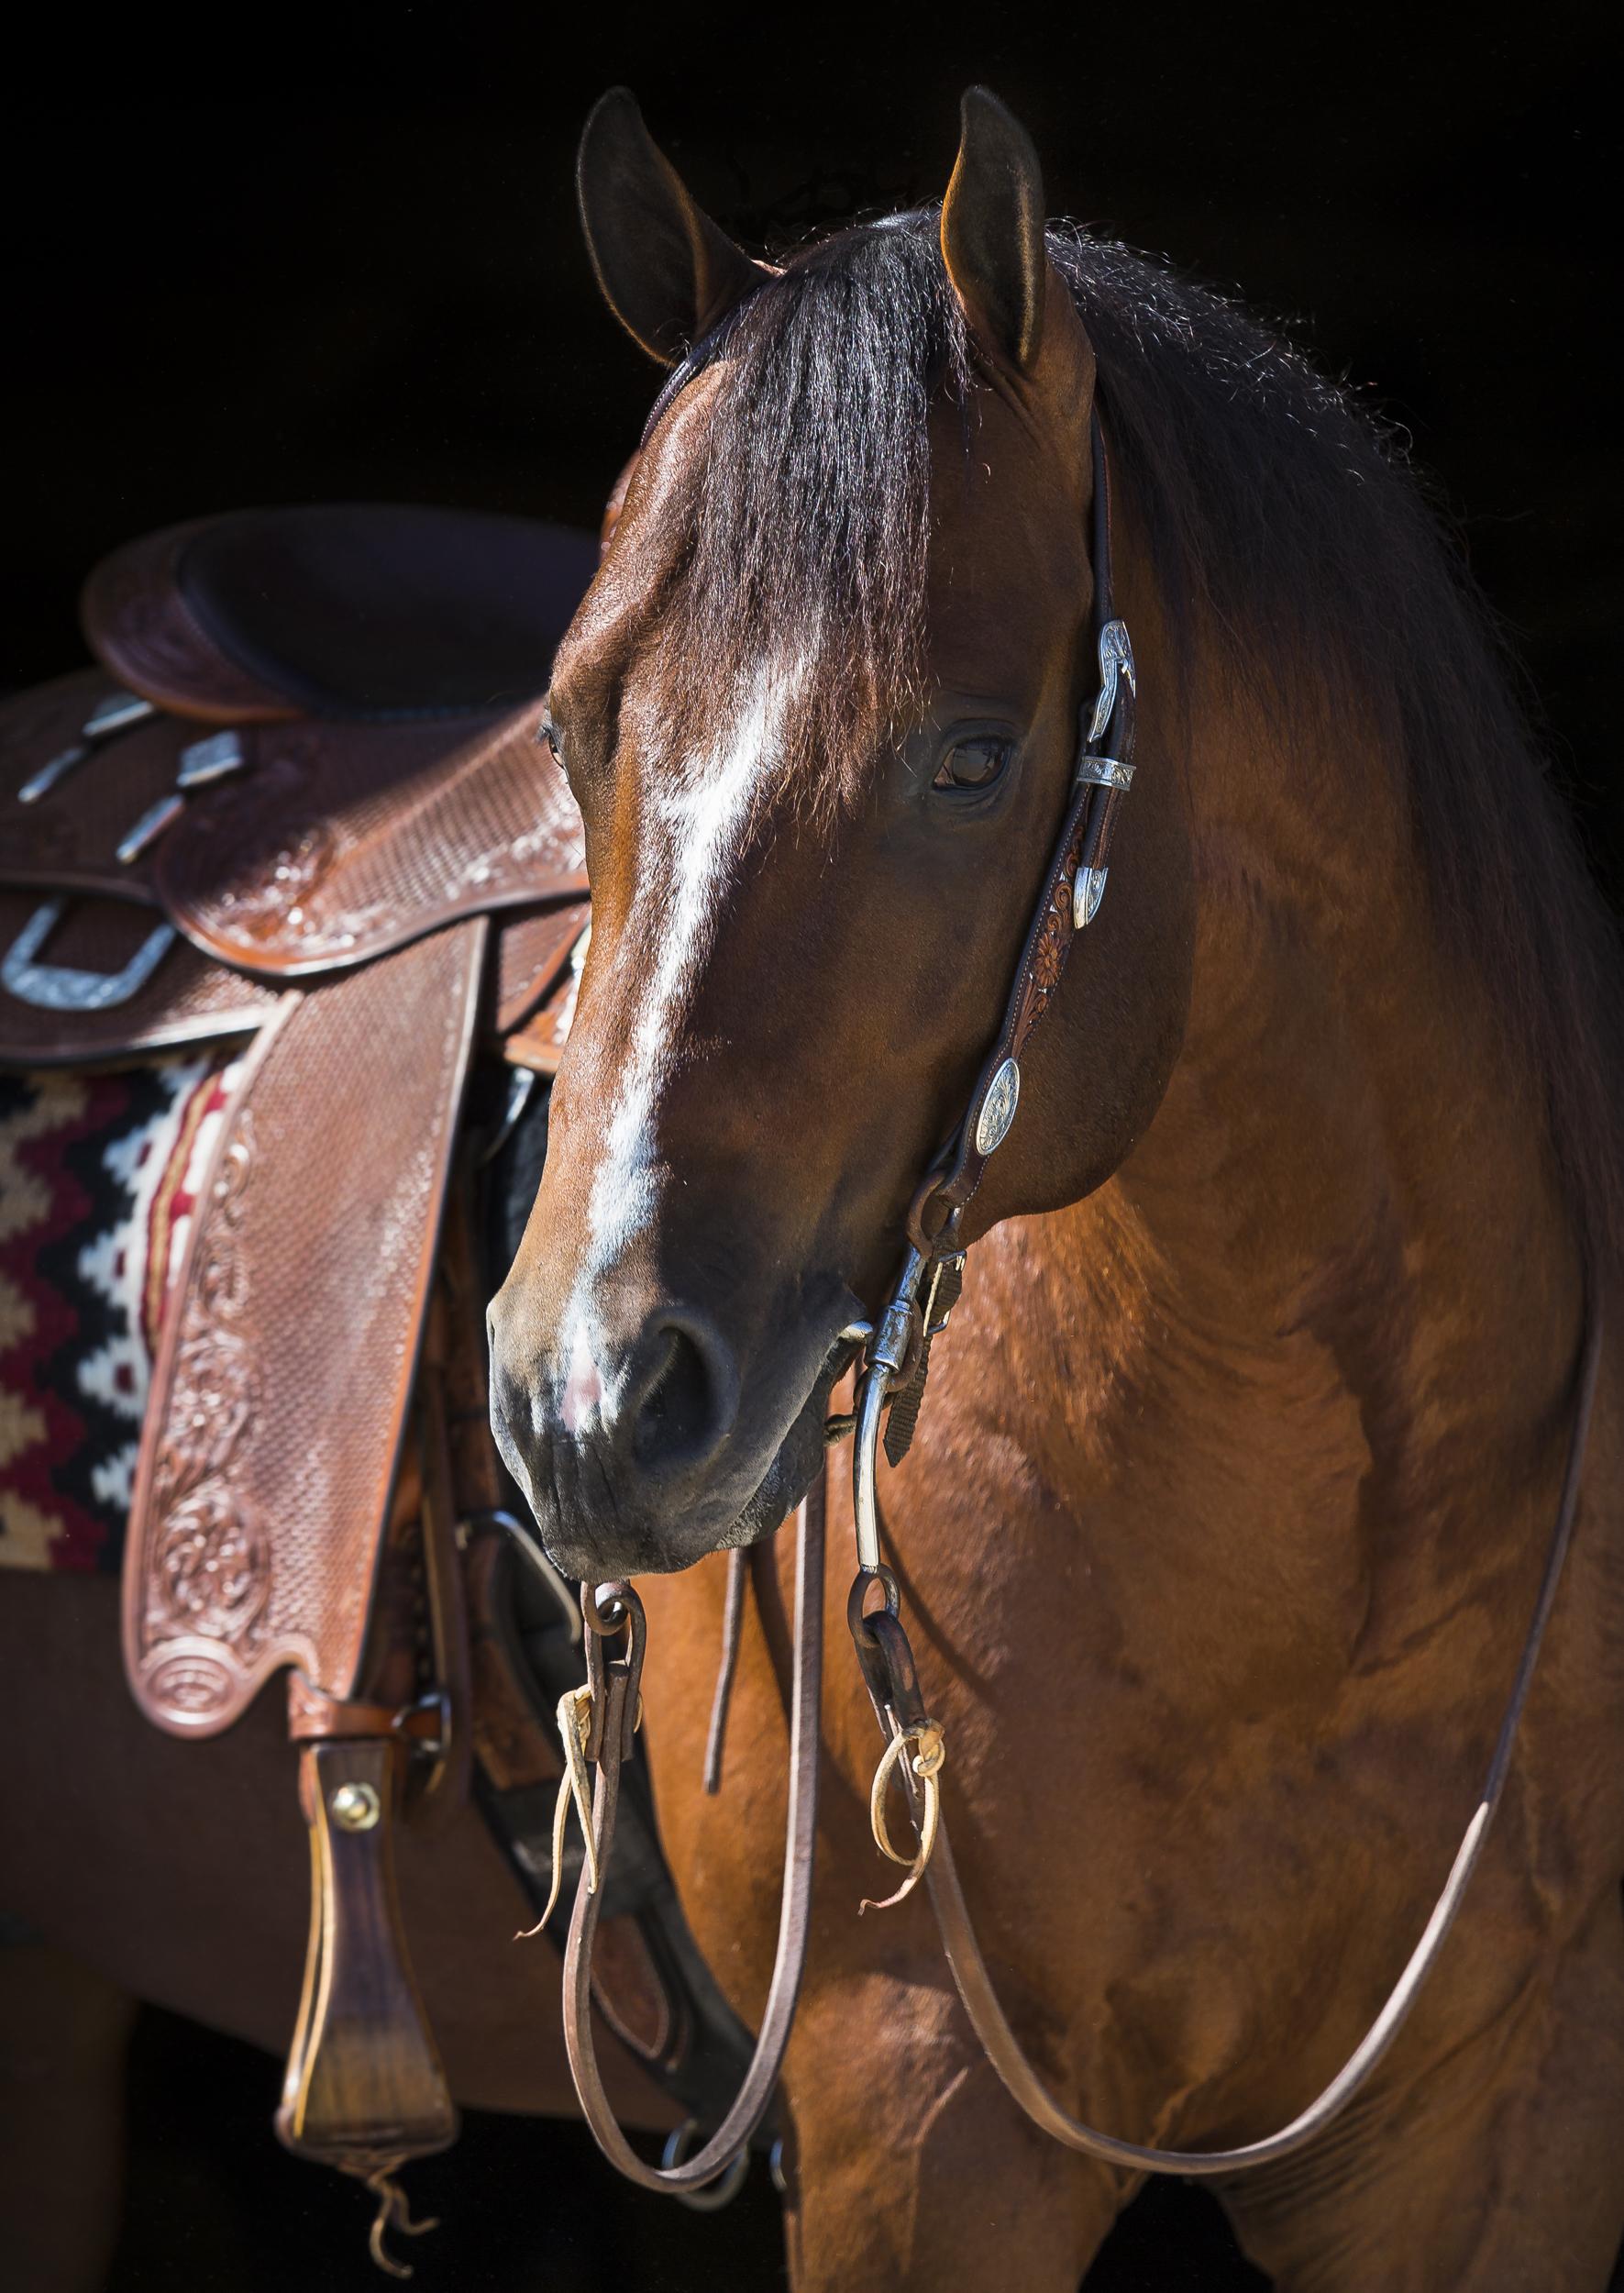 Horse-.jpg